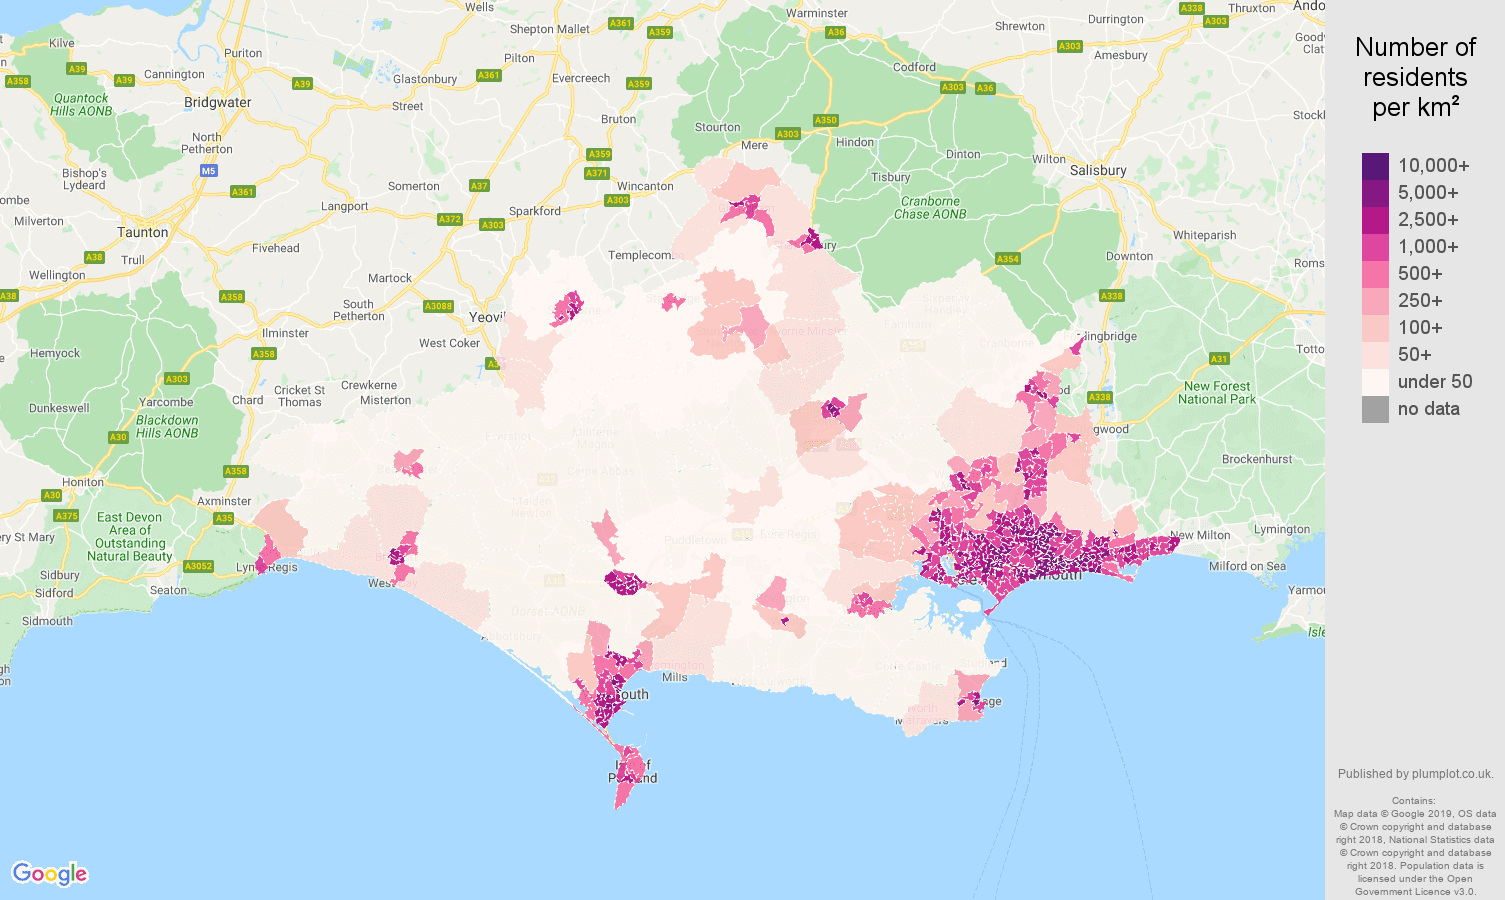 Dorset population density map